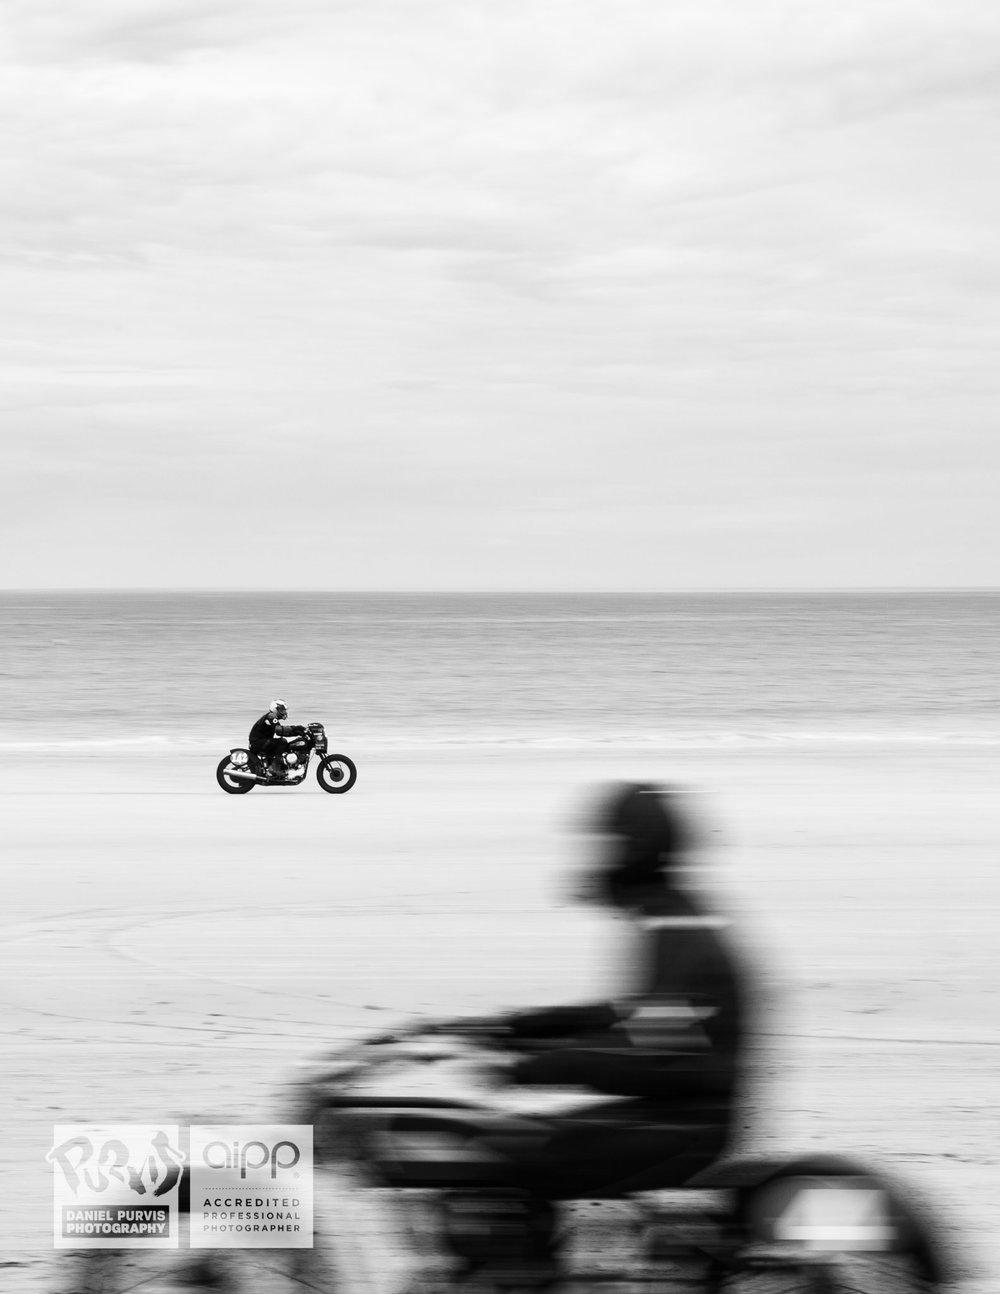 (142) Charlie Palmer tearing up the beach on a 1937 1200cc Harley-Davidson. © Daniel Purvis